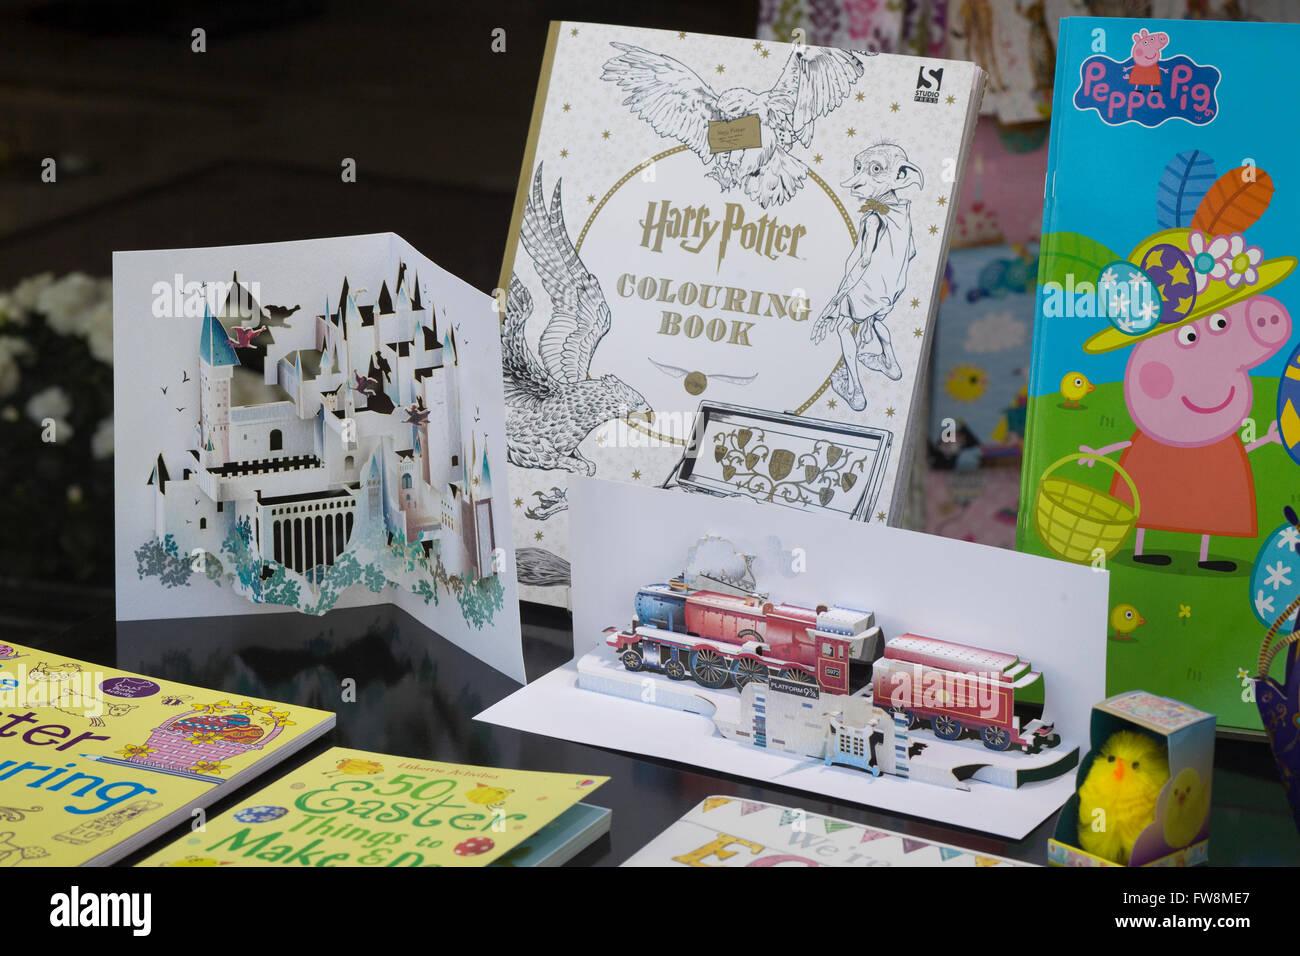 Pop Up Books Stockfotos & Pop Up Books Bilder - Alamy